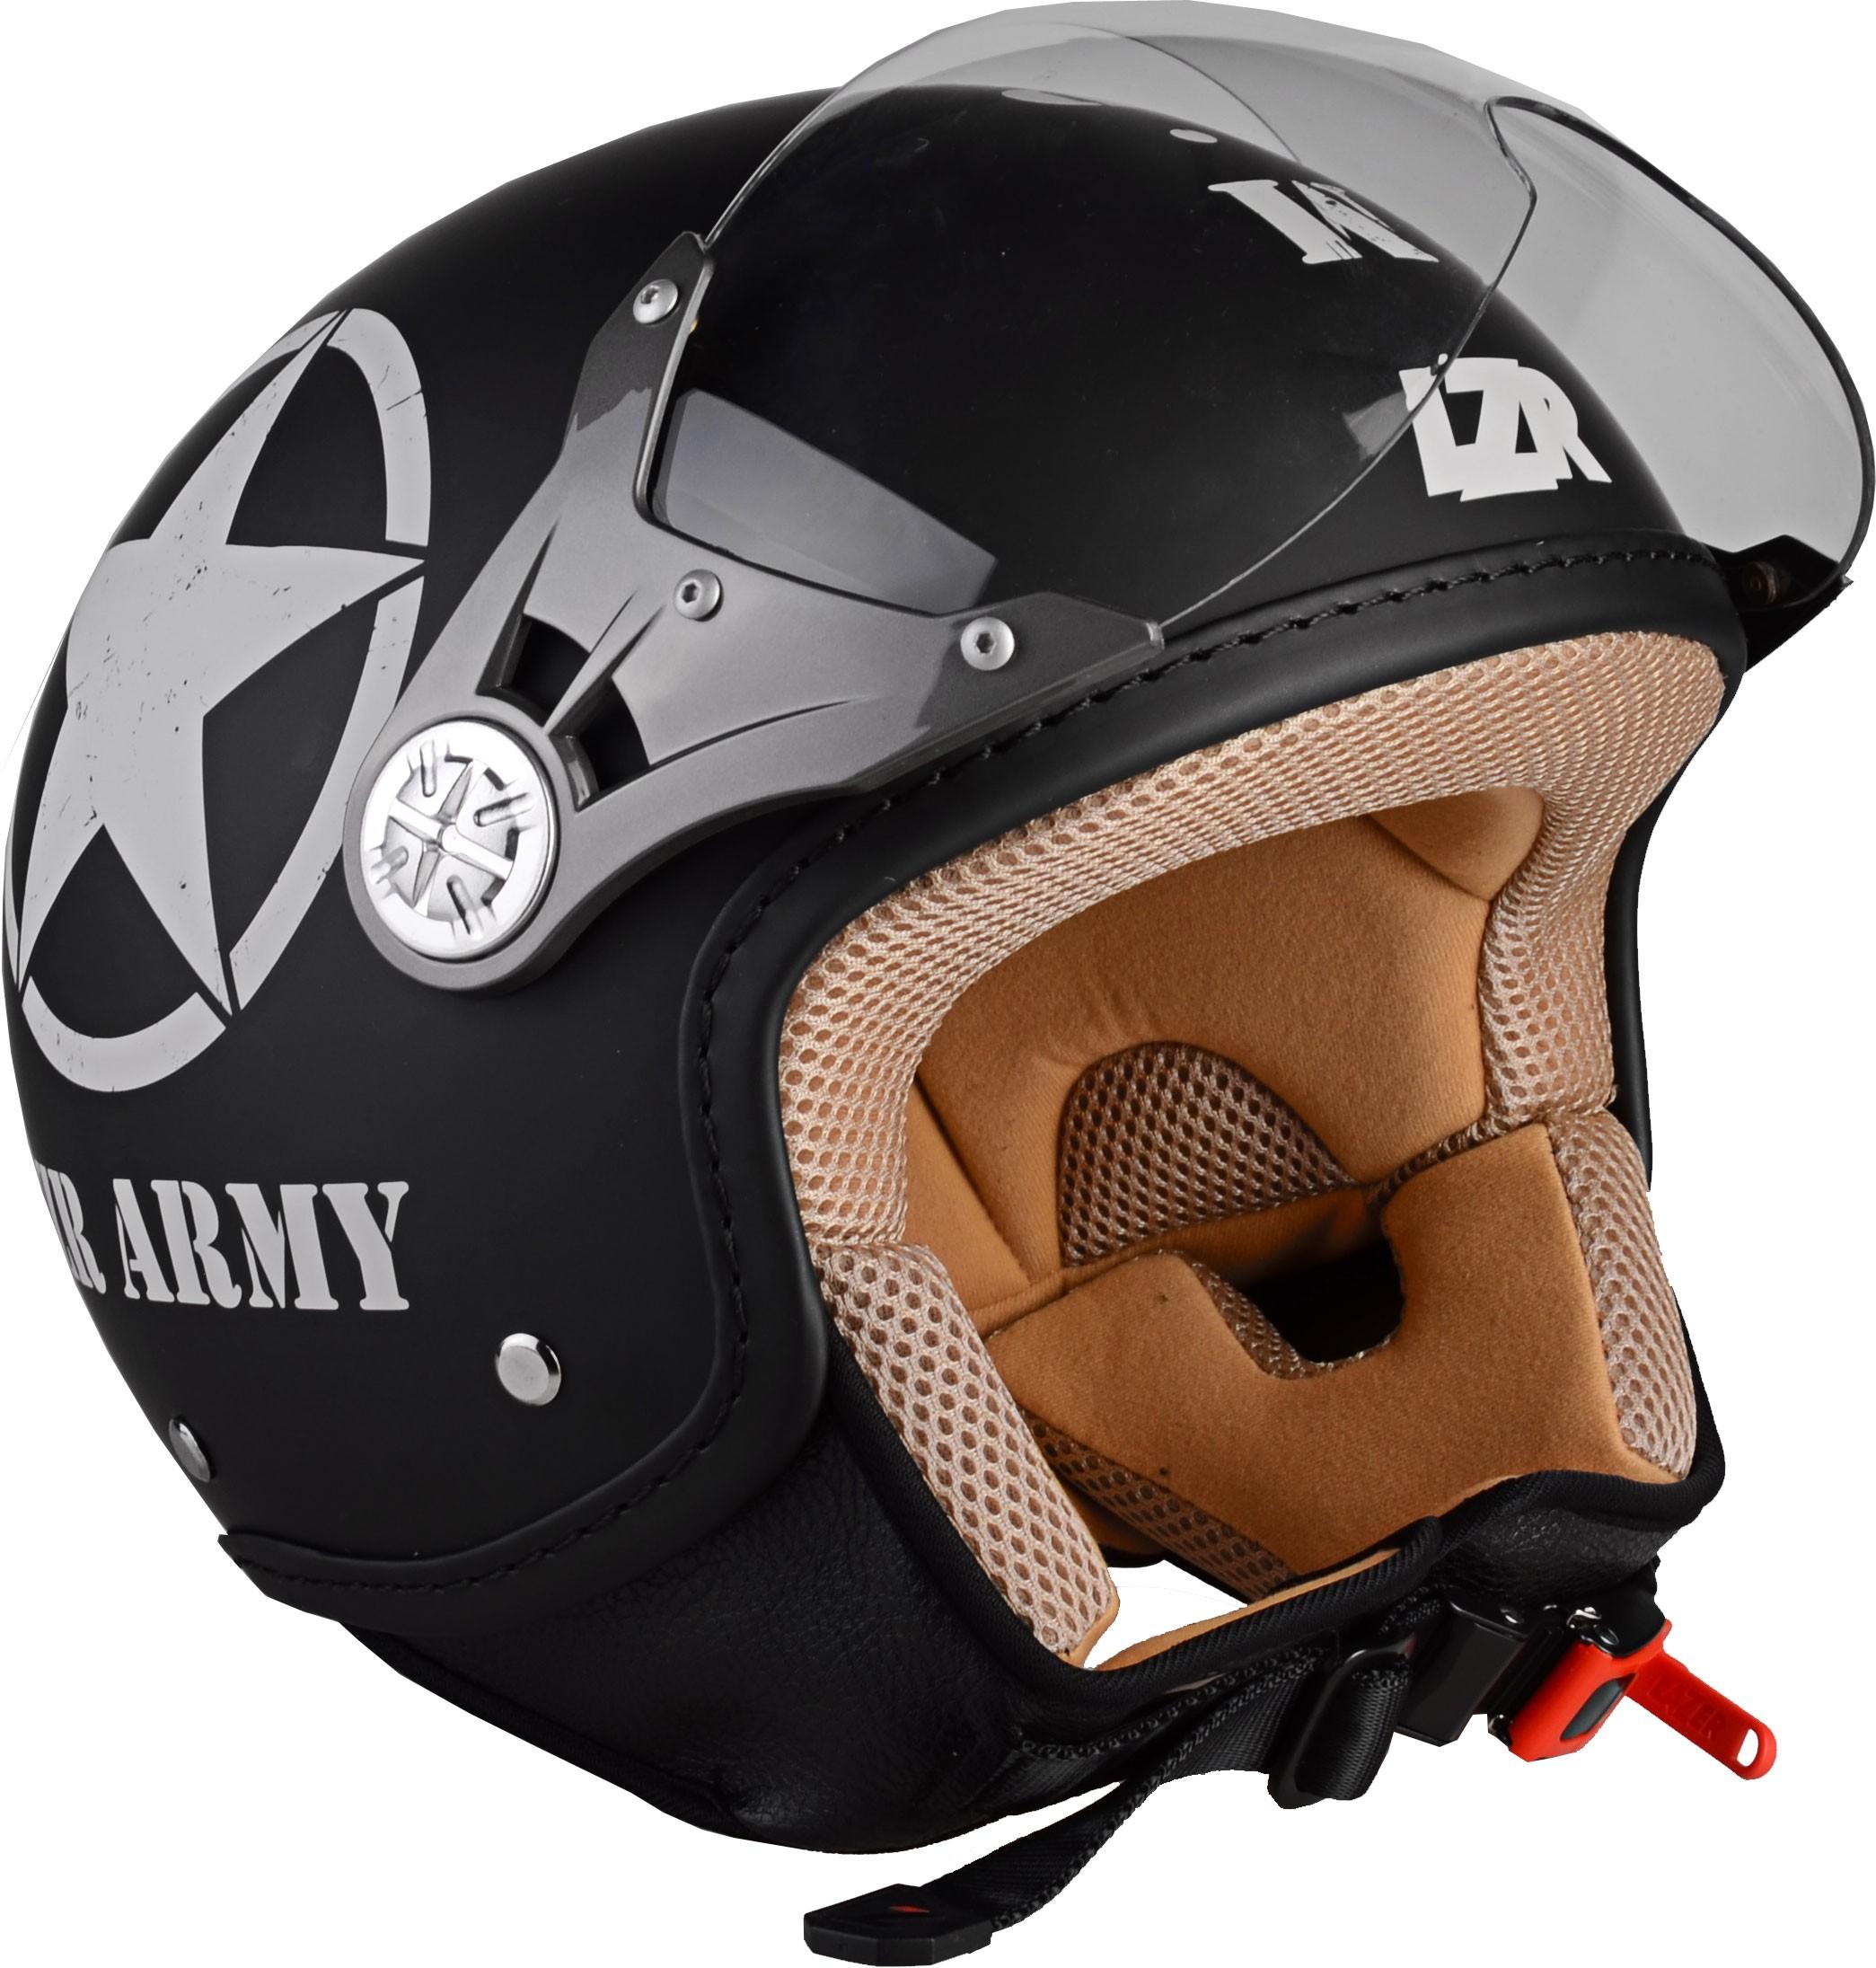 Casque de moto aviateur